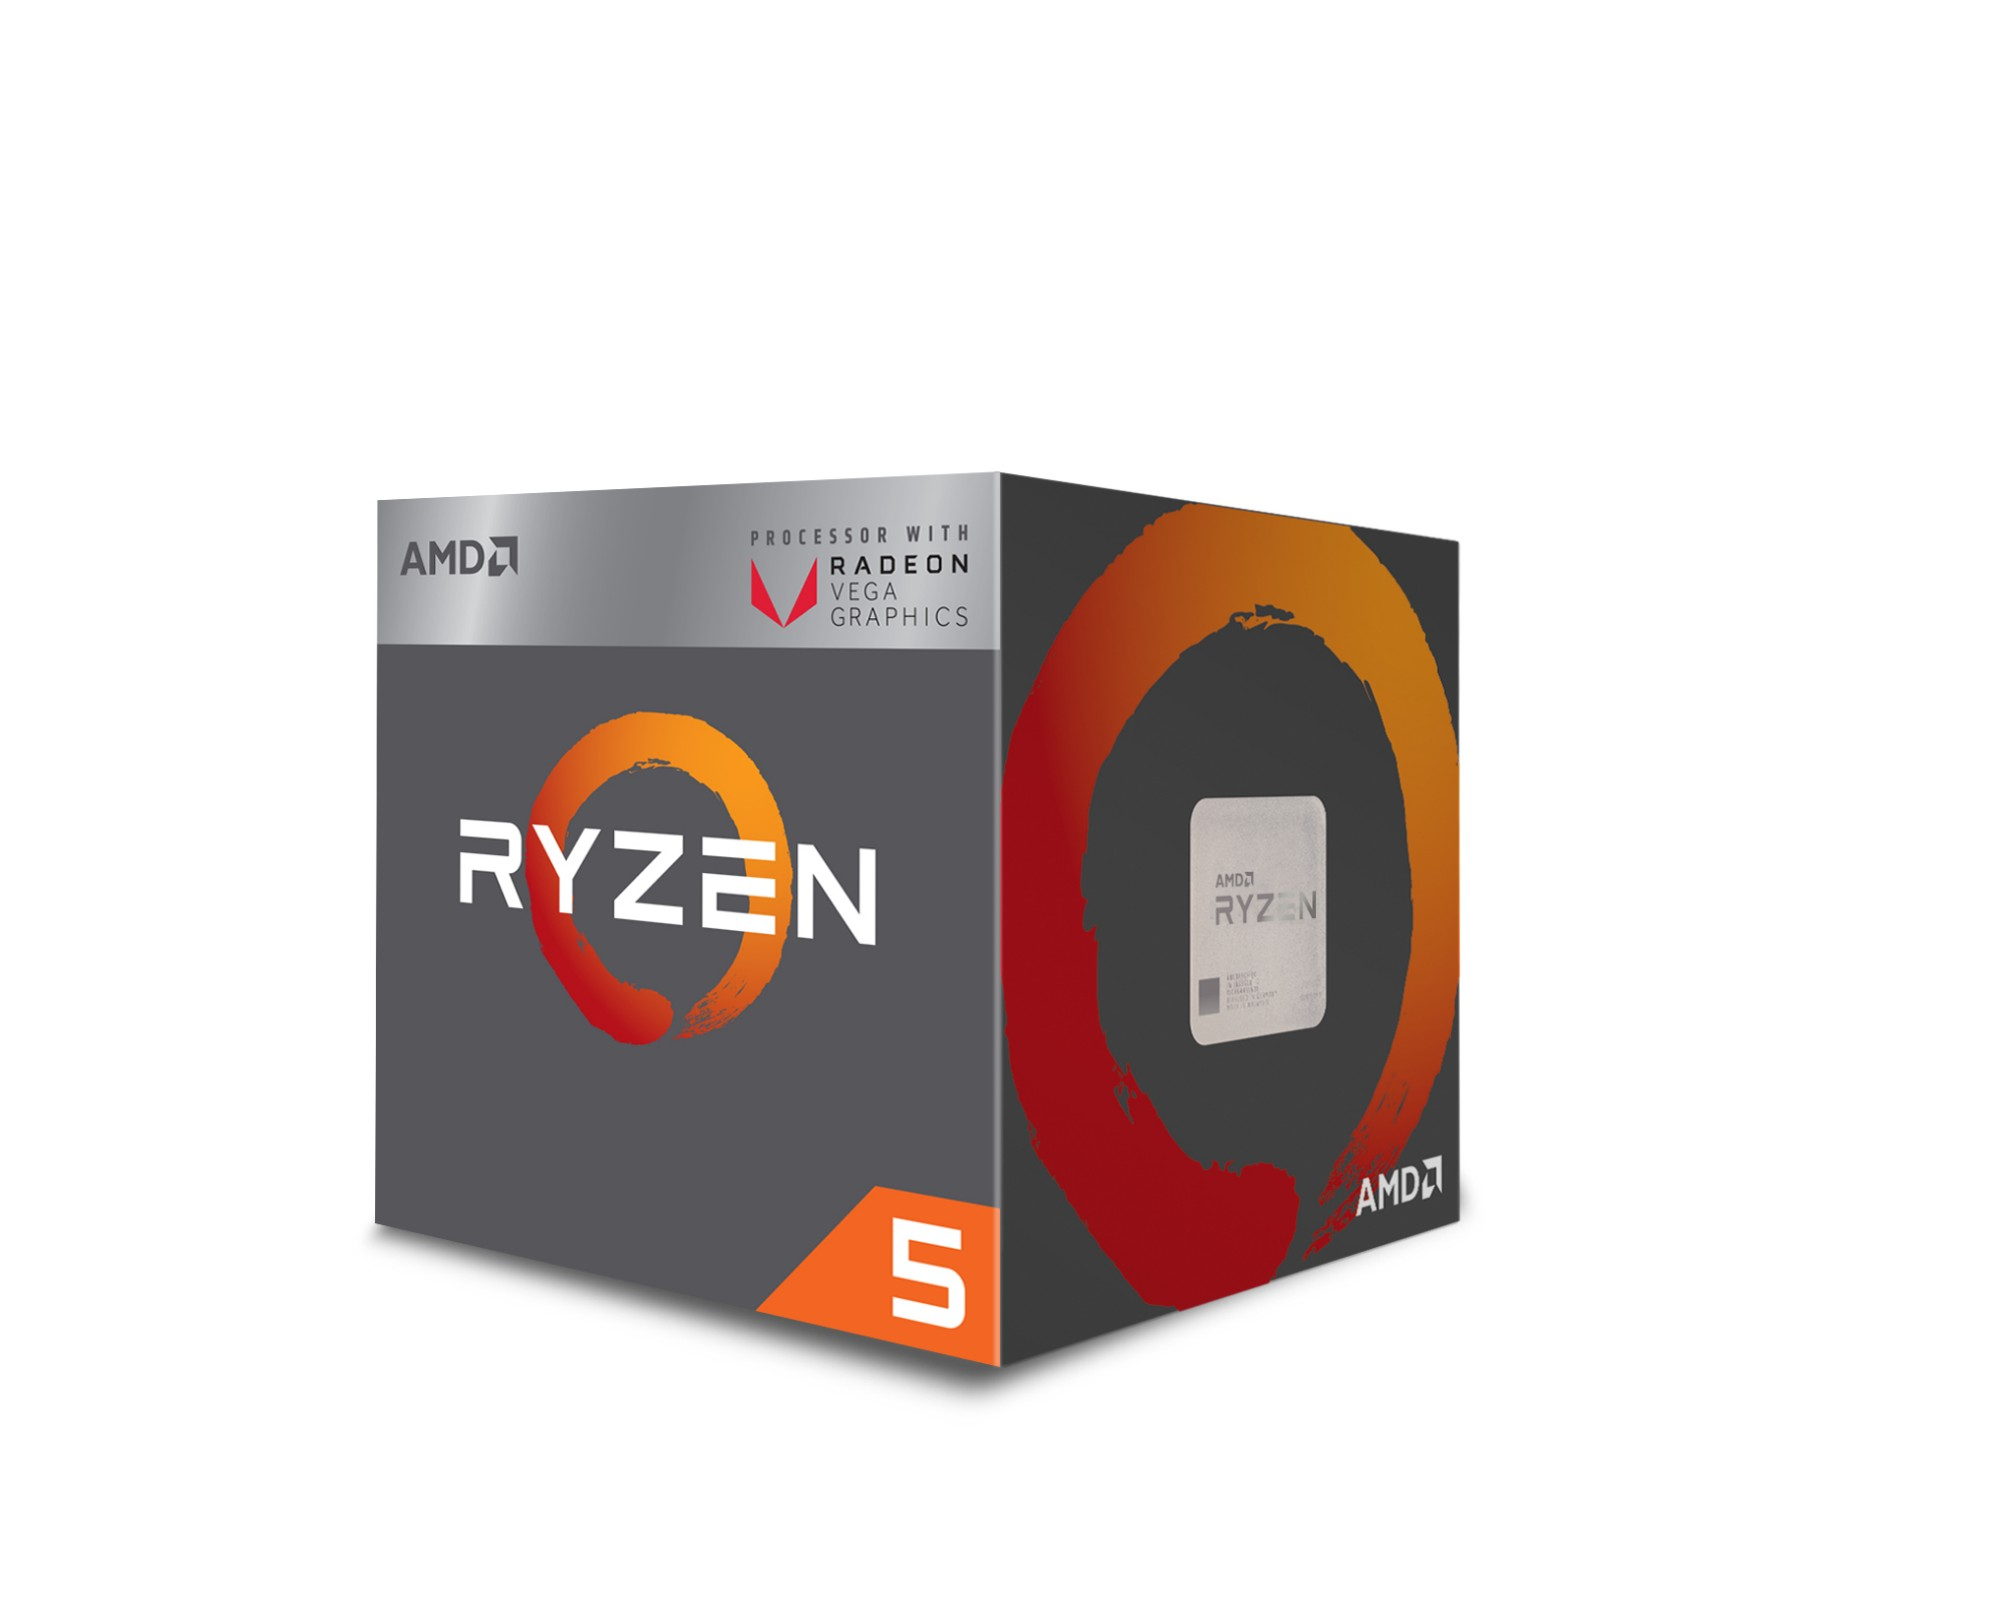 AMD Ryzen 5 2400G 3.6GHz 2MB L2 Box processor